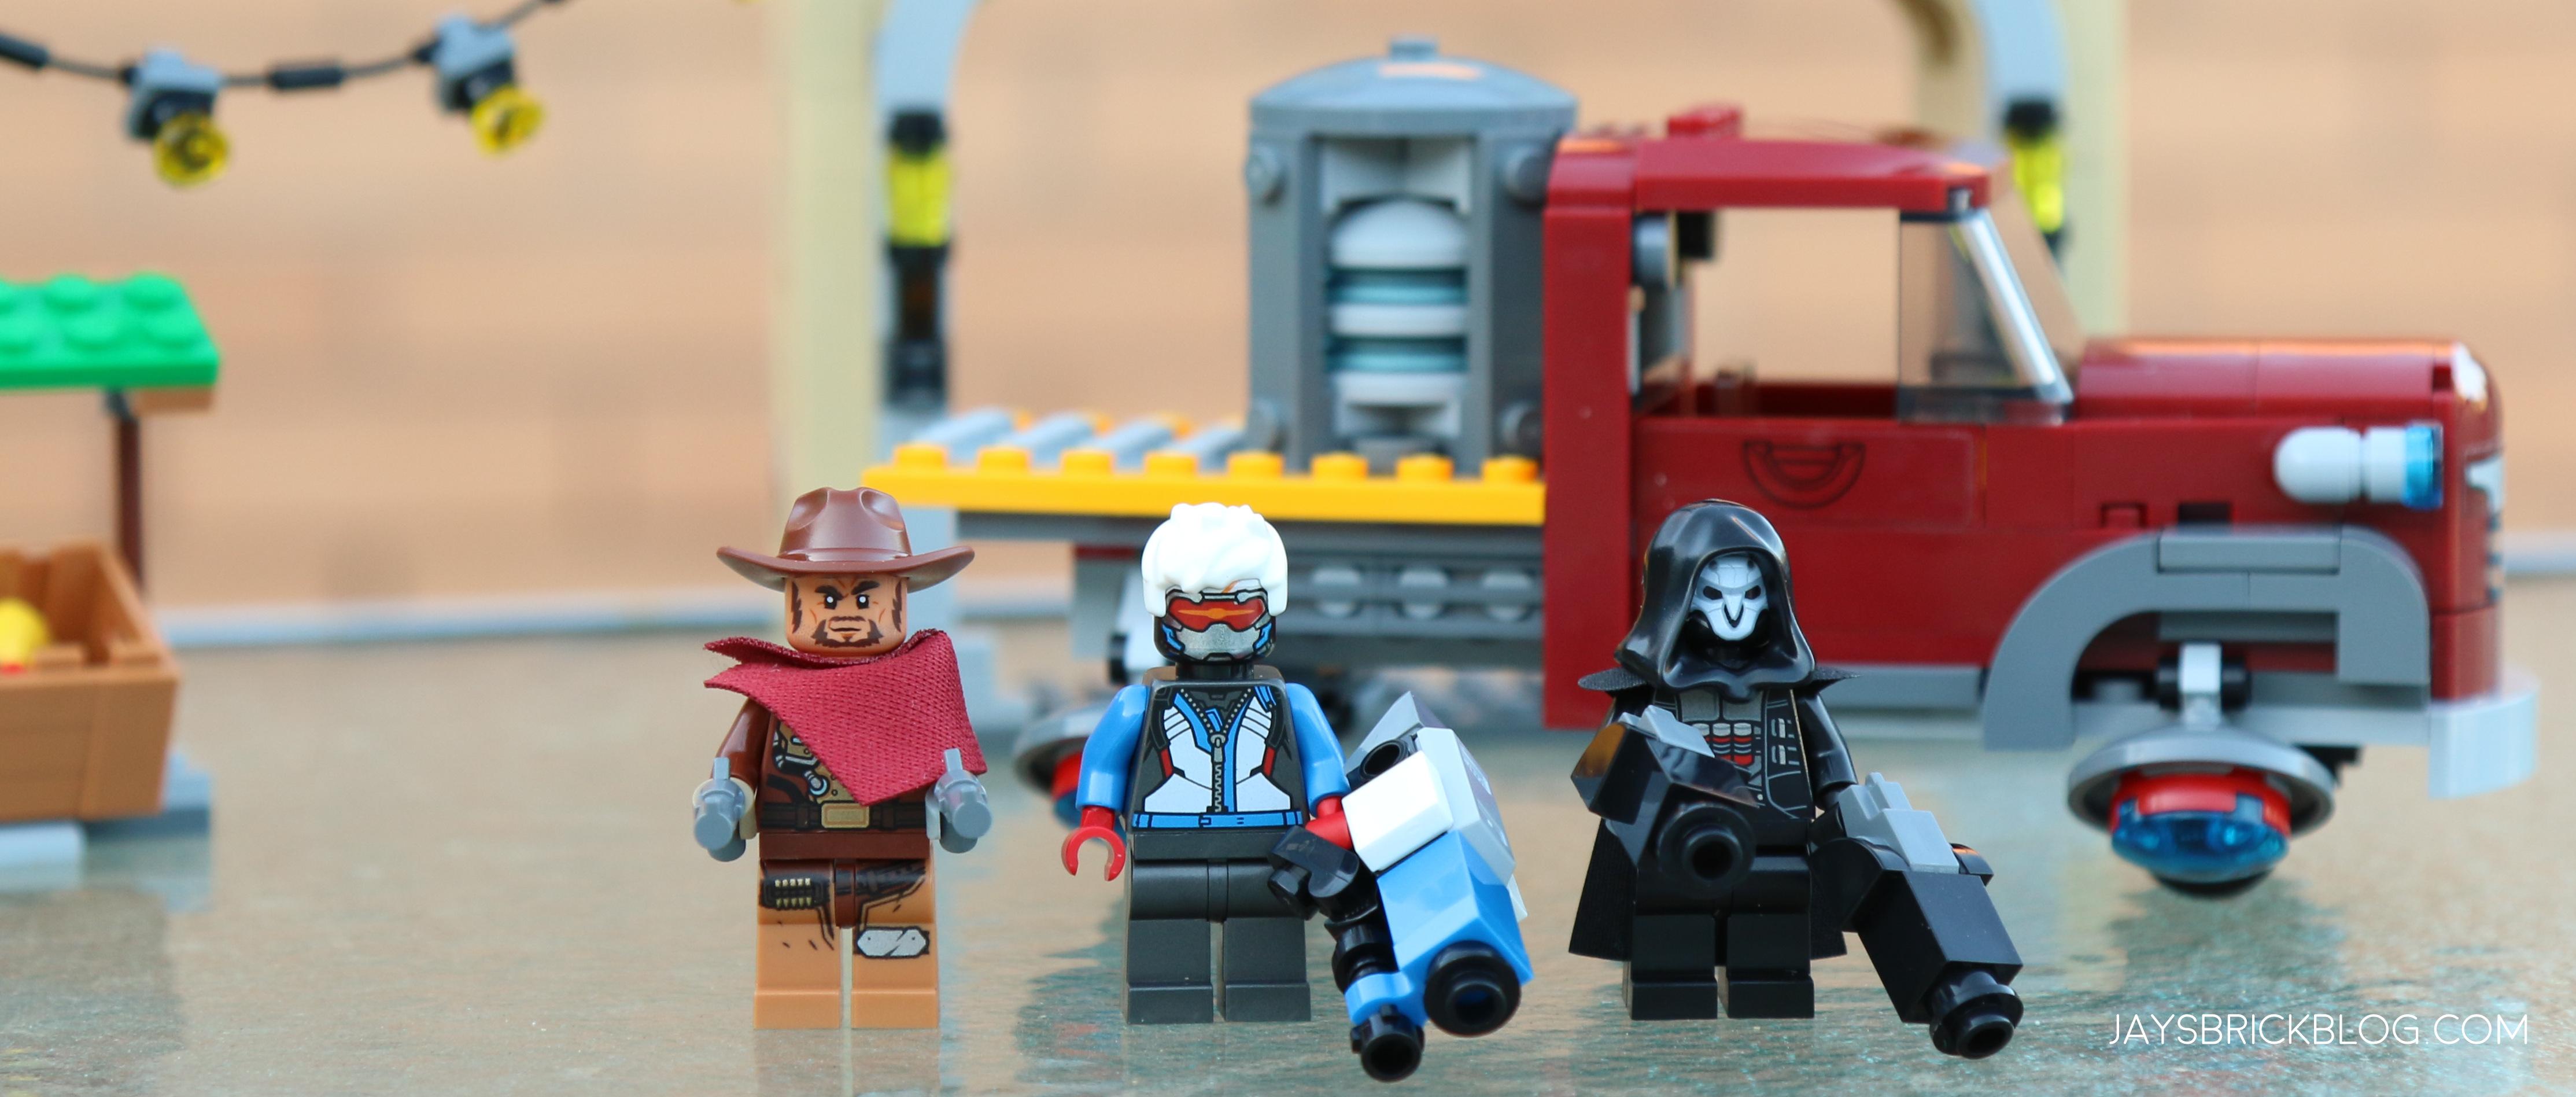 Overwatch Christmas 2019 Release Date Review: LEGO 75972 Dorado Showdown – Jay's Brick Blog